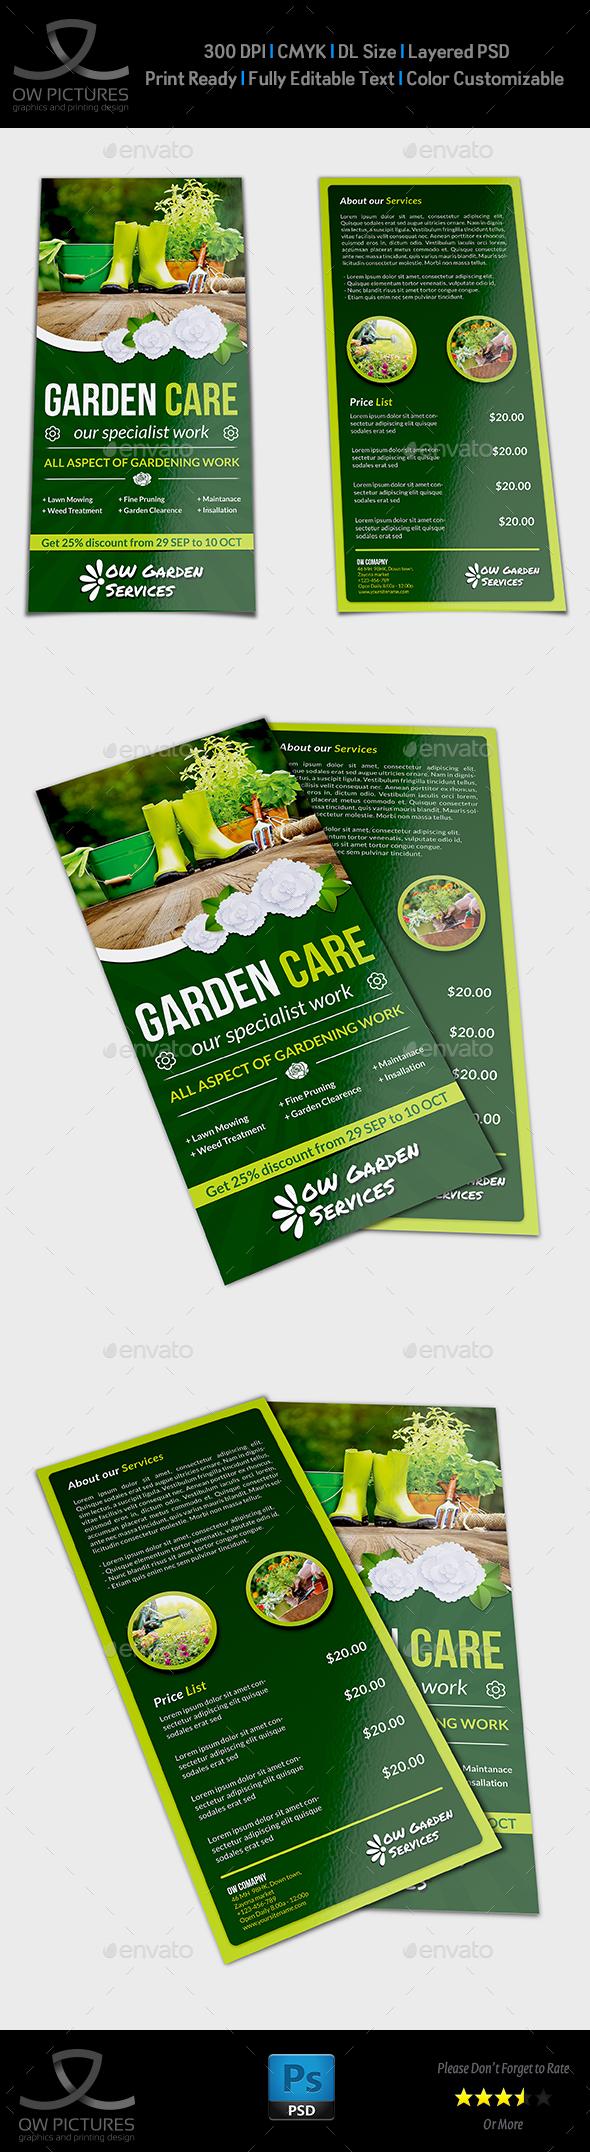 Garden Services Flyer Template DL Size Vol.2 - Flyers Print Templates